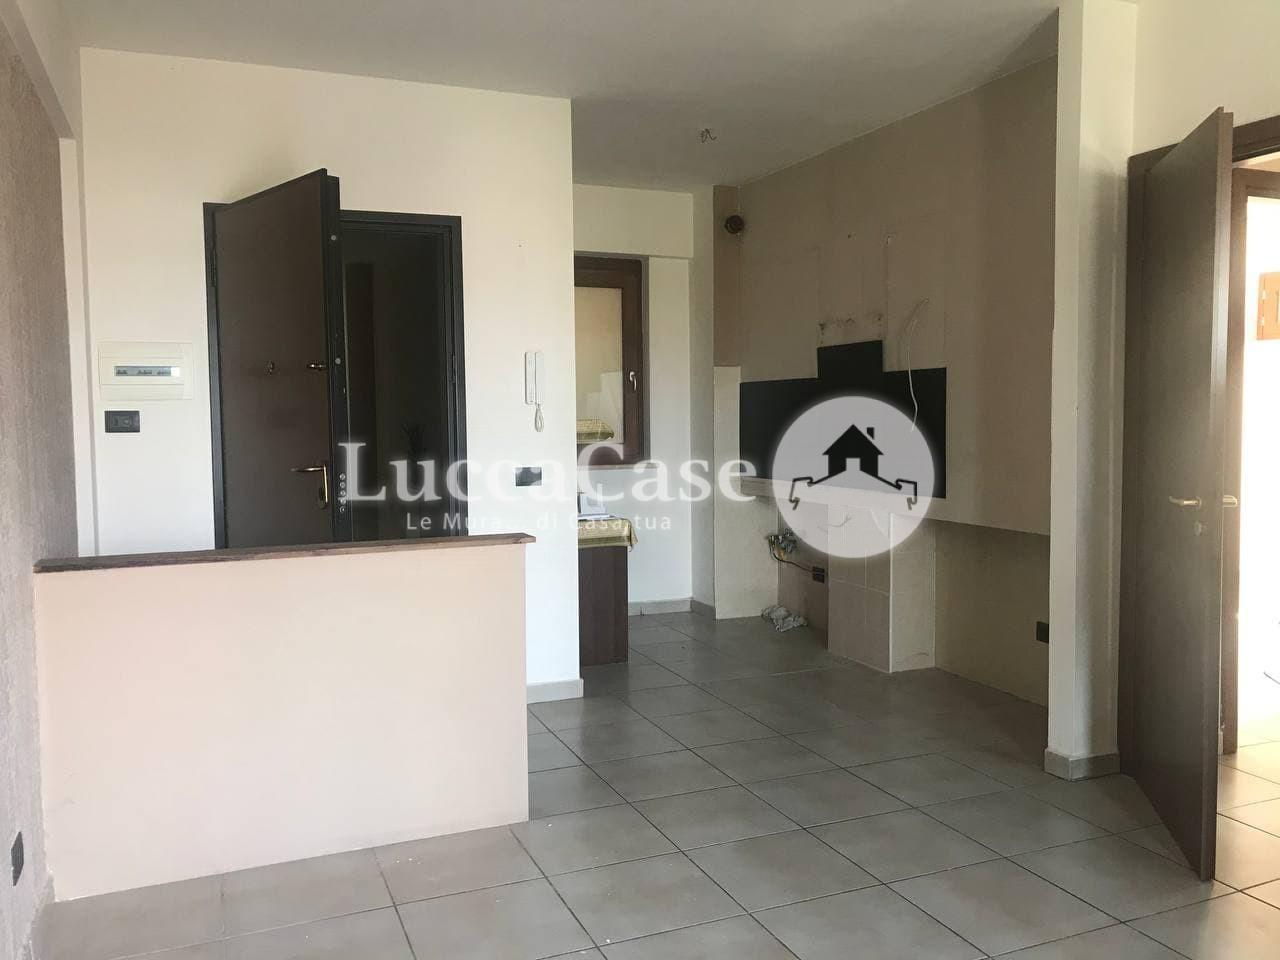 Appartamento in vendita, rif. N089S